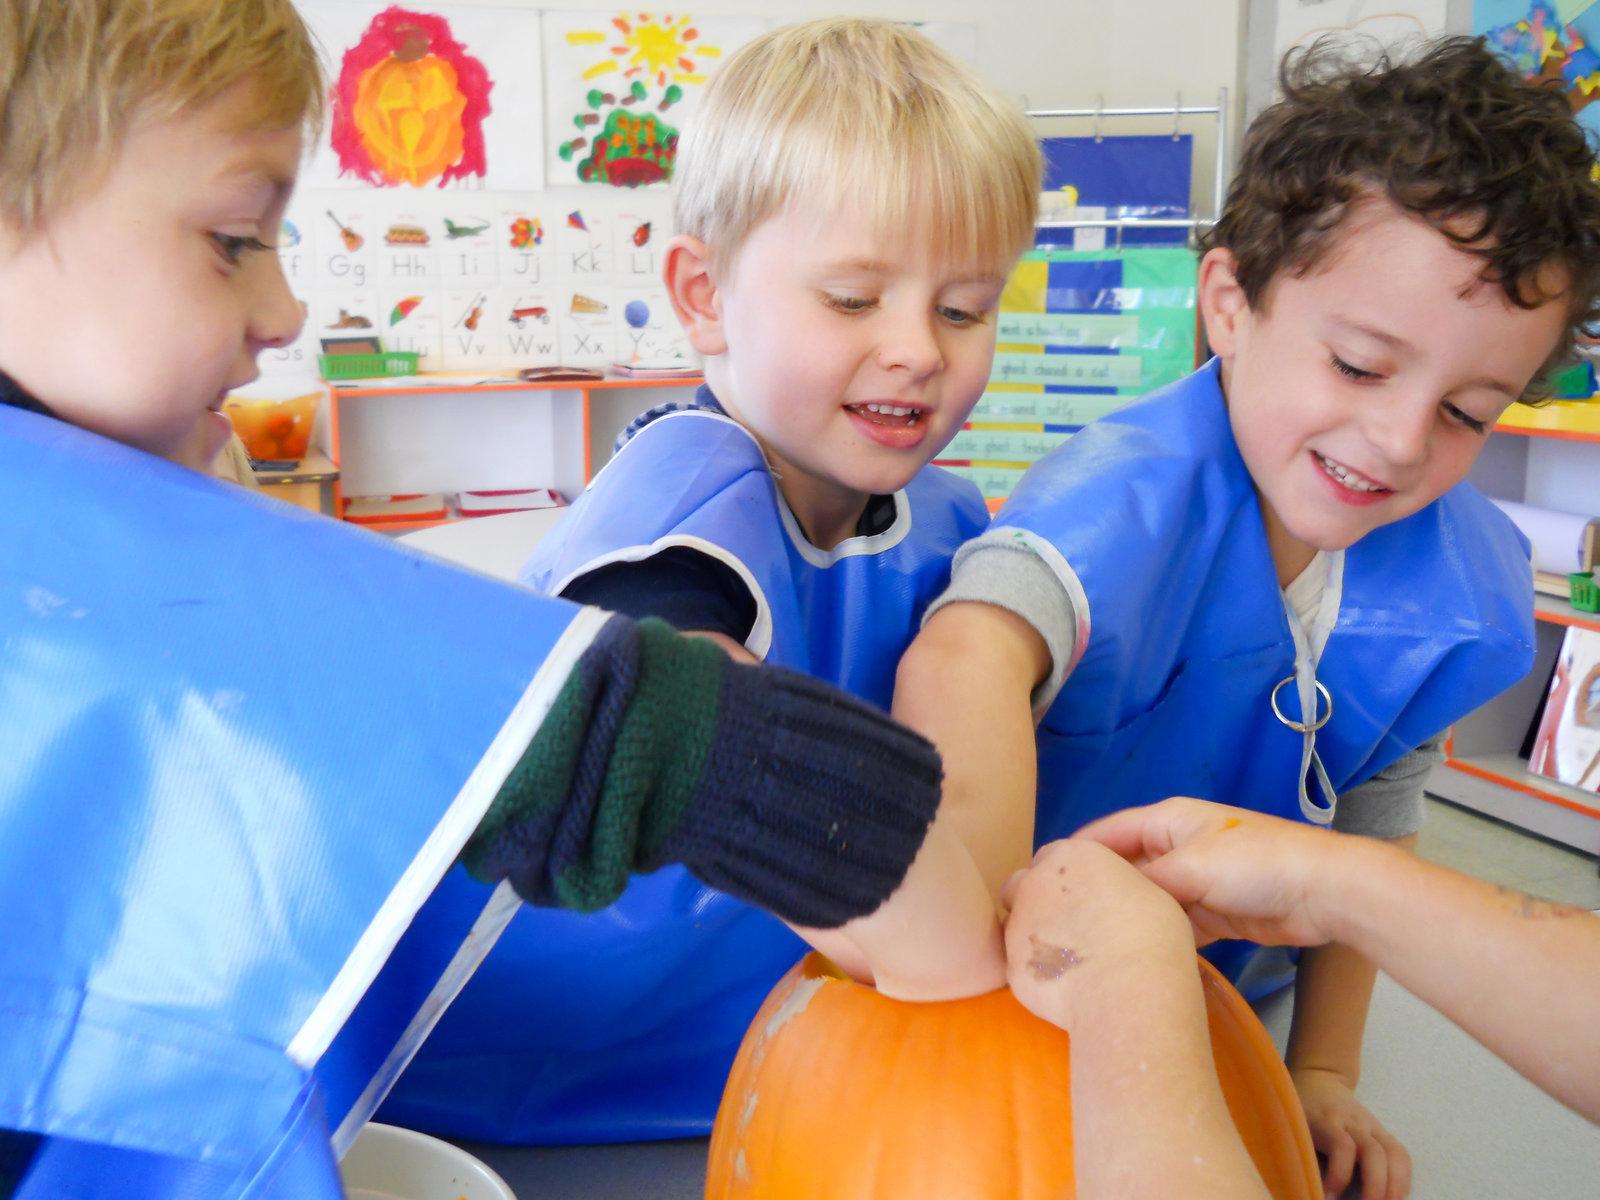 rye-ny-nursery-school-ccns-7